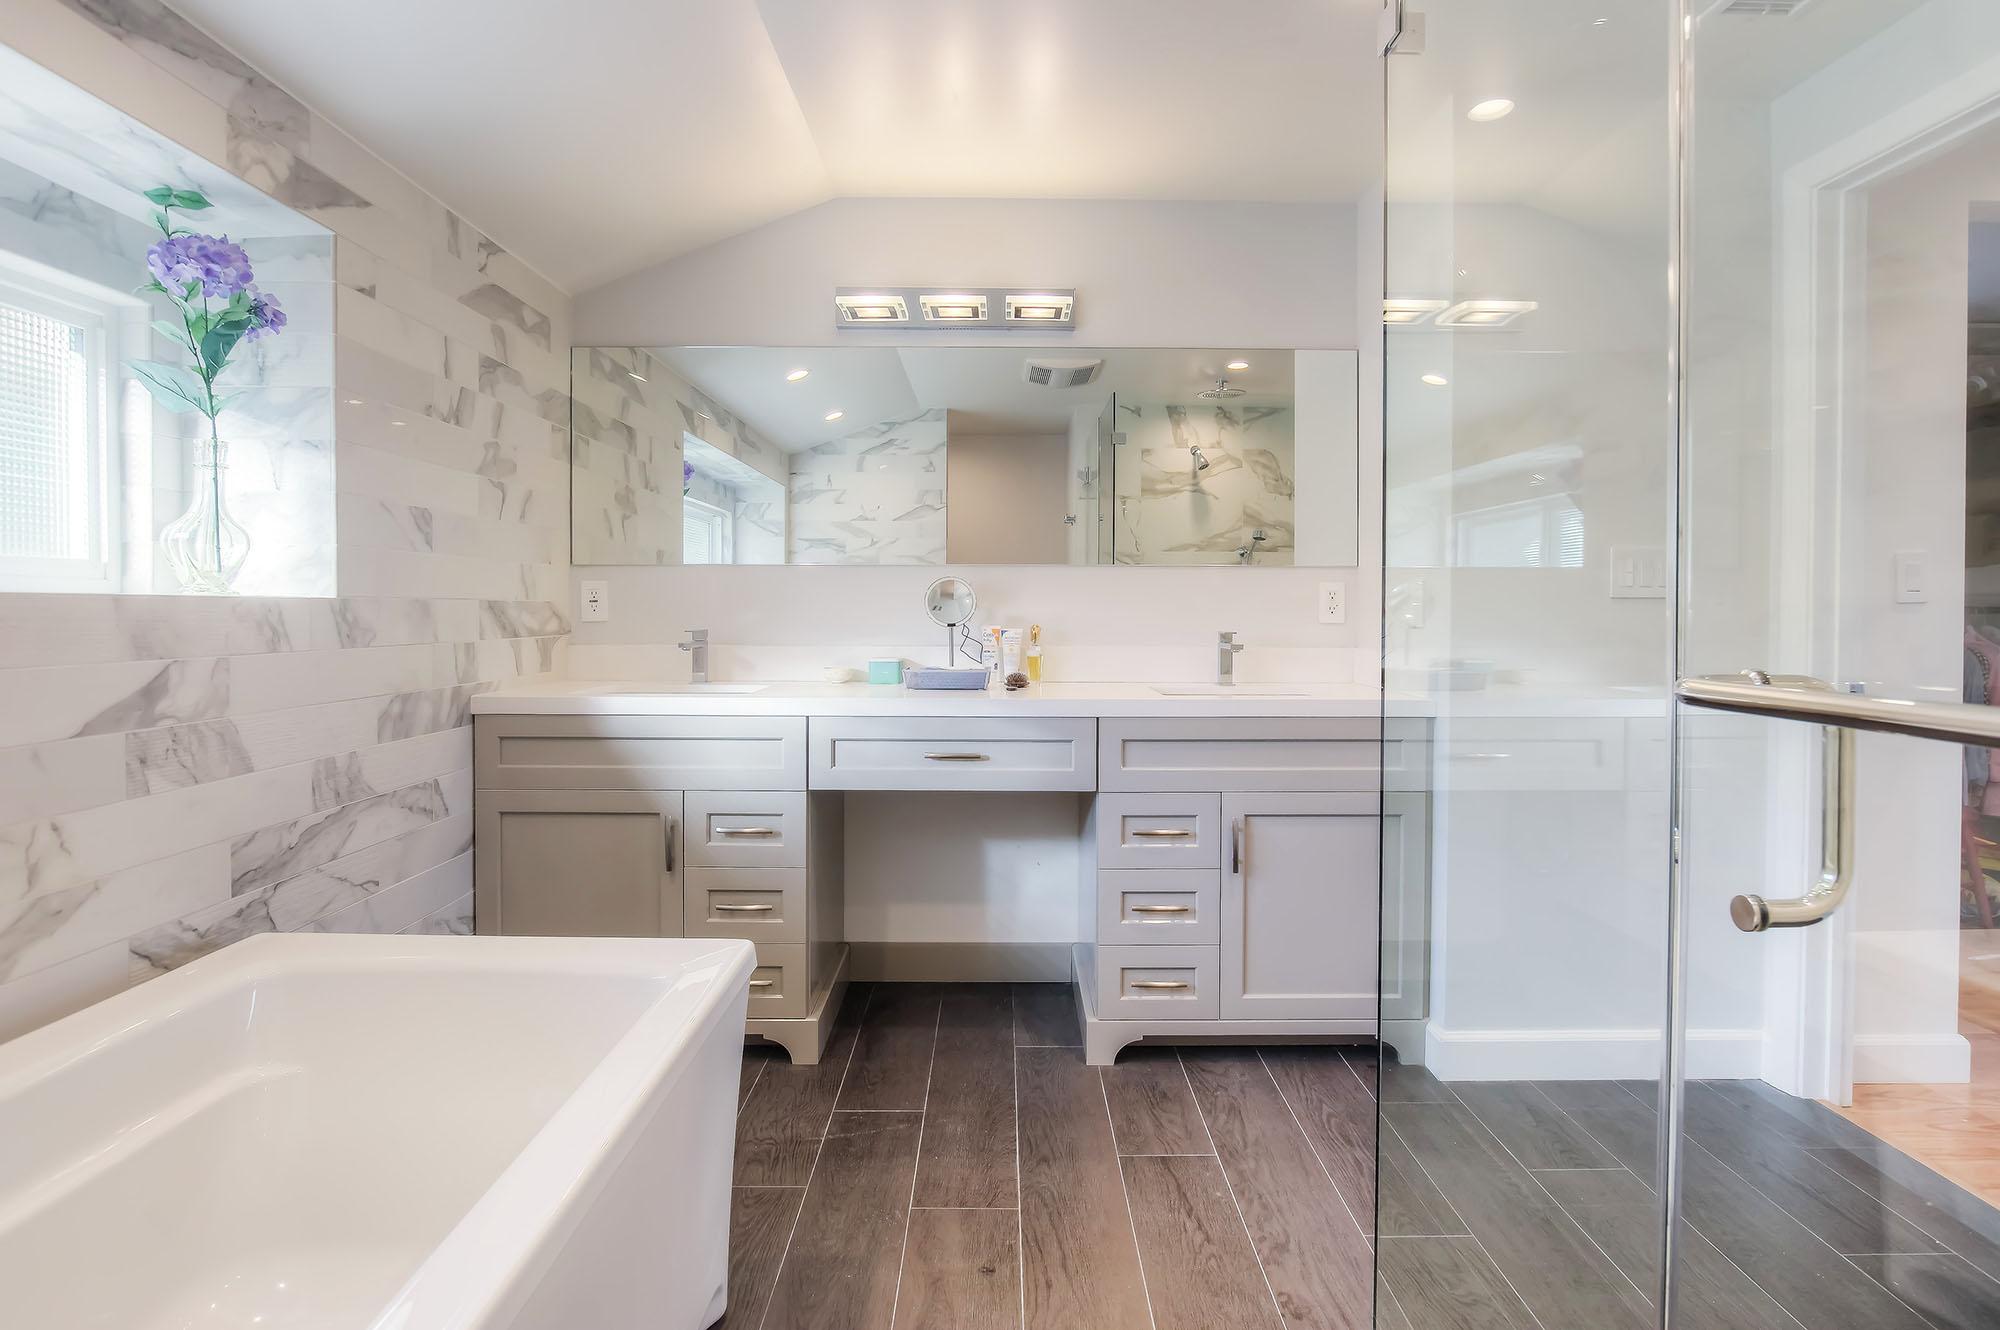 glendale tiles and wood flooring